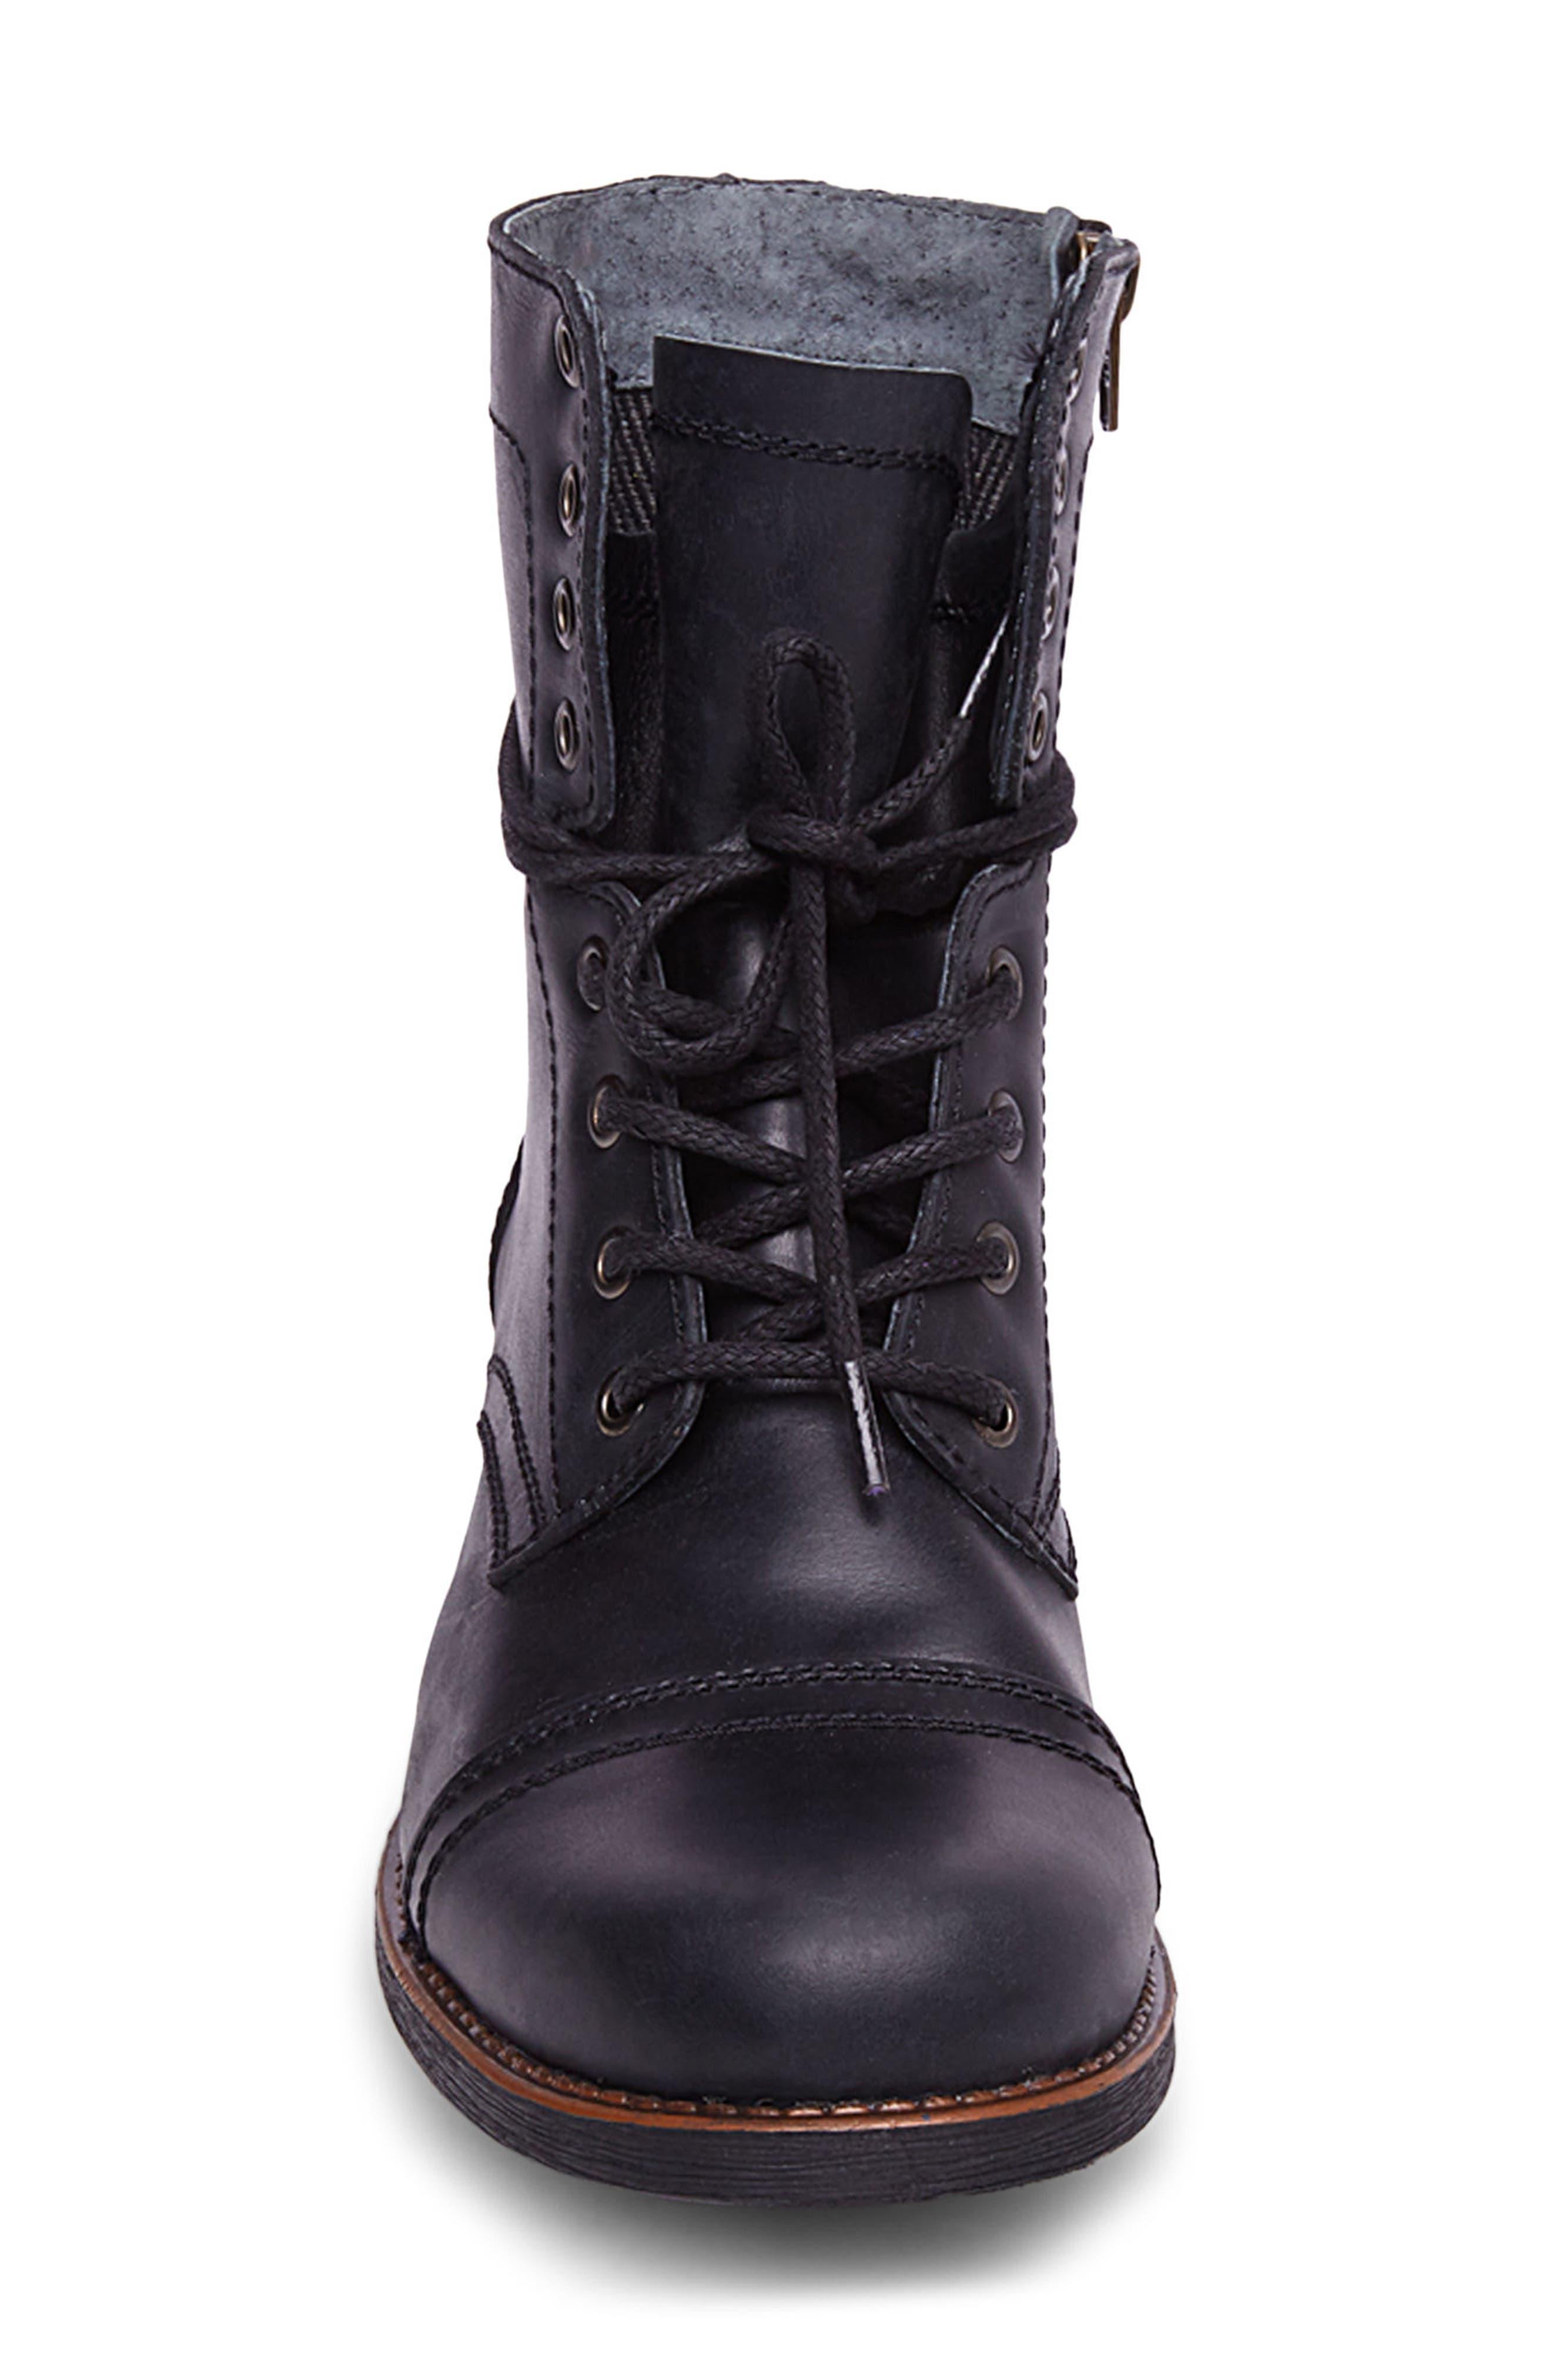 Troopah-C Cap Toe Boot,                             Alternate thumbnail 4, color,                             Black Leather